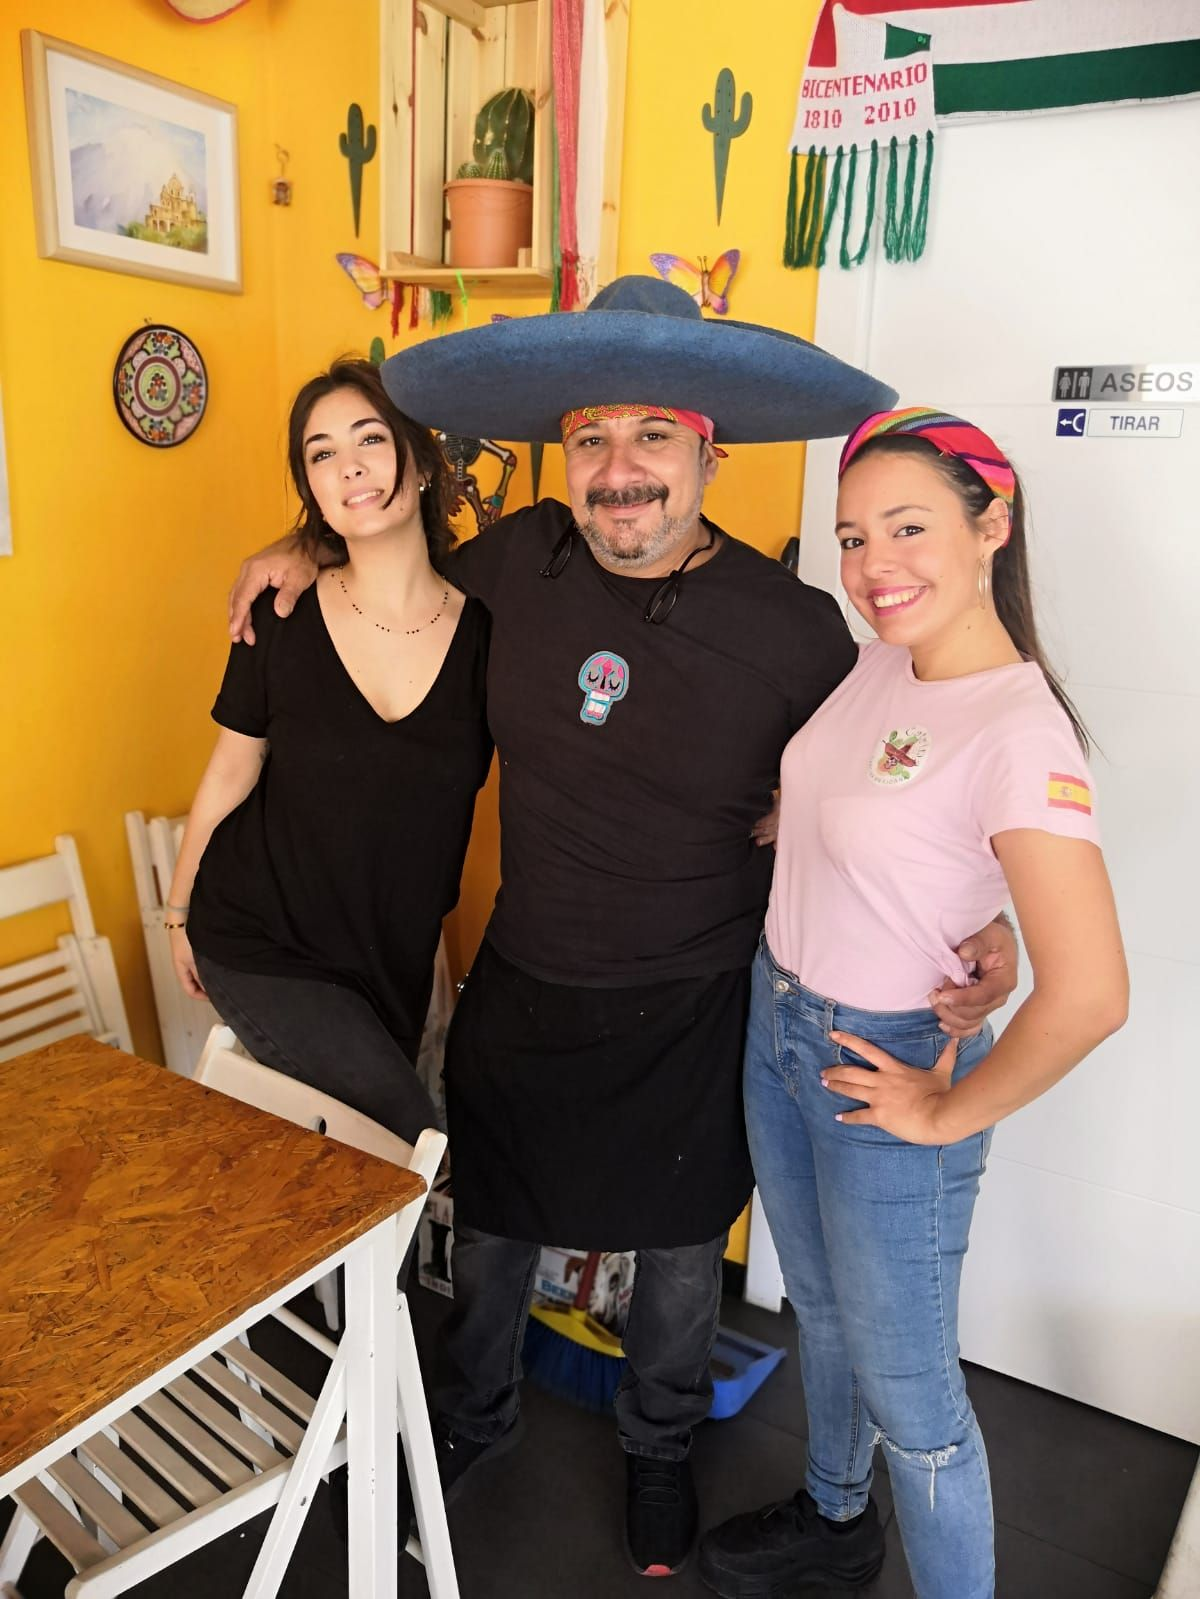 Foto 27 de Restaurante mexicano en  | Cantina La Catrina